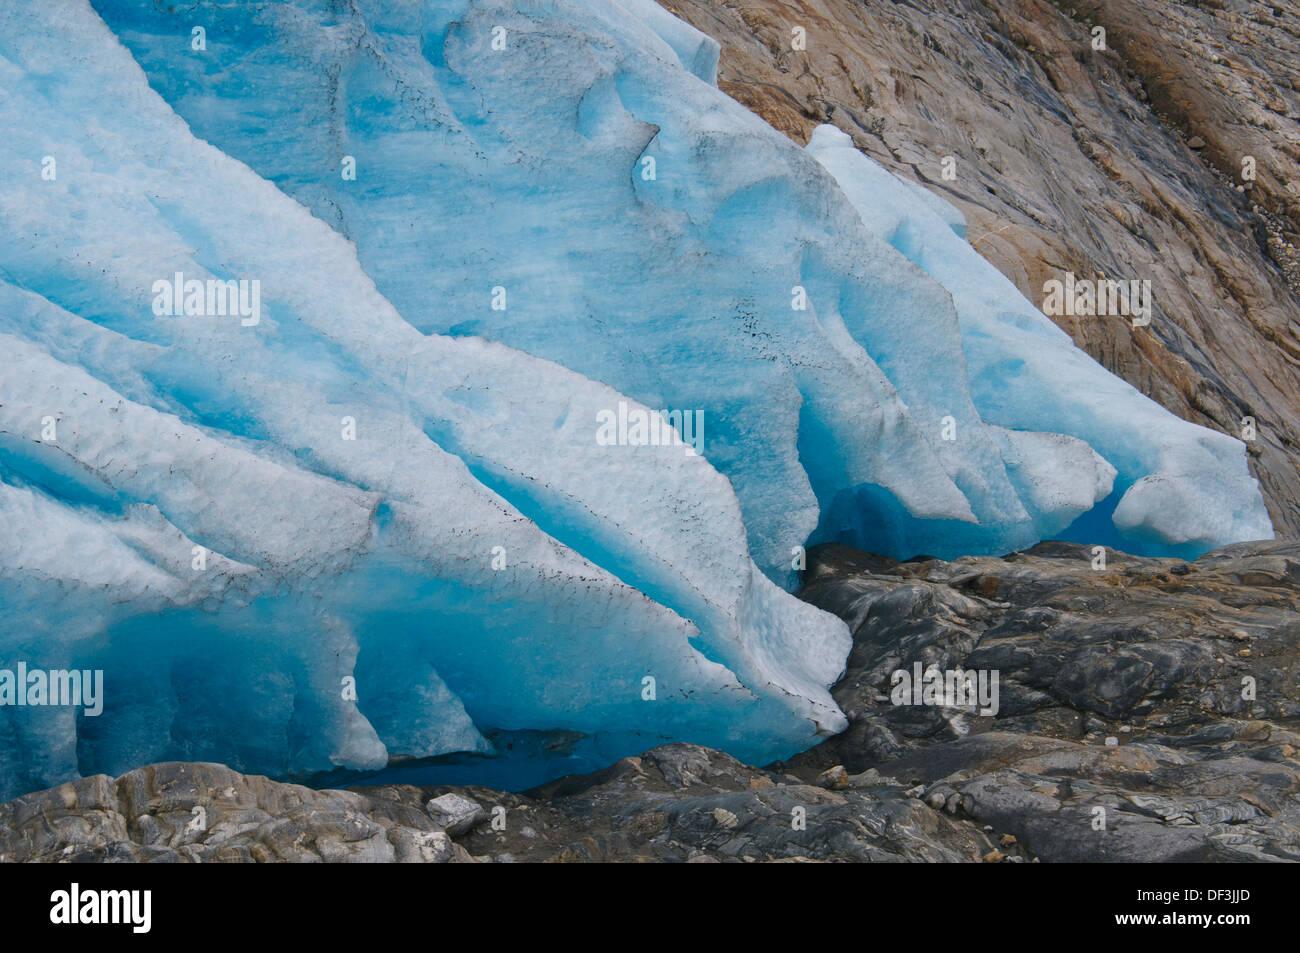 Norway / Nordland / Svartisen National Park - Impacts of Climate Change: glacier melting. Retreating Engenbreen glacier. - Stock Image